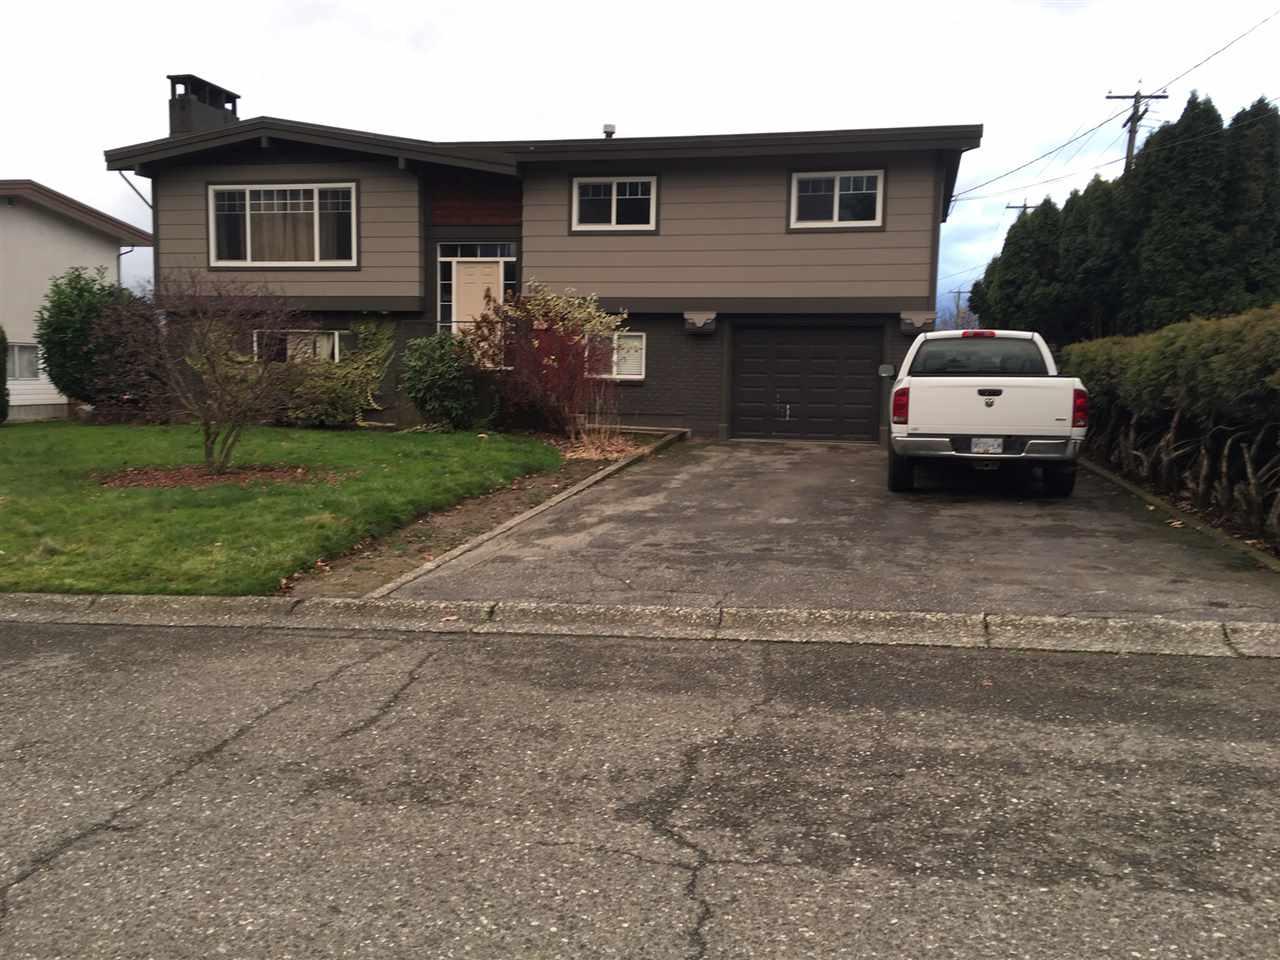 Sold: 9464 Paula Crescent, Chilliwack, BC